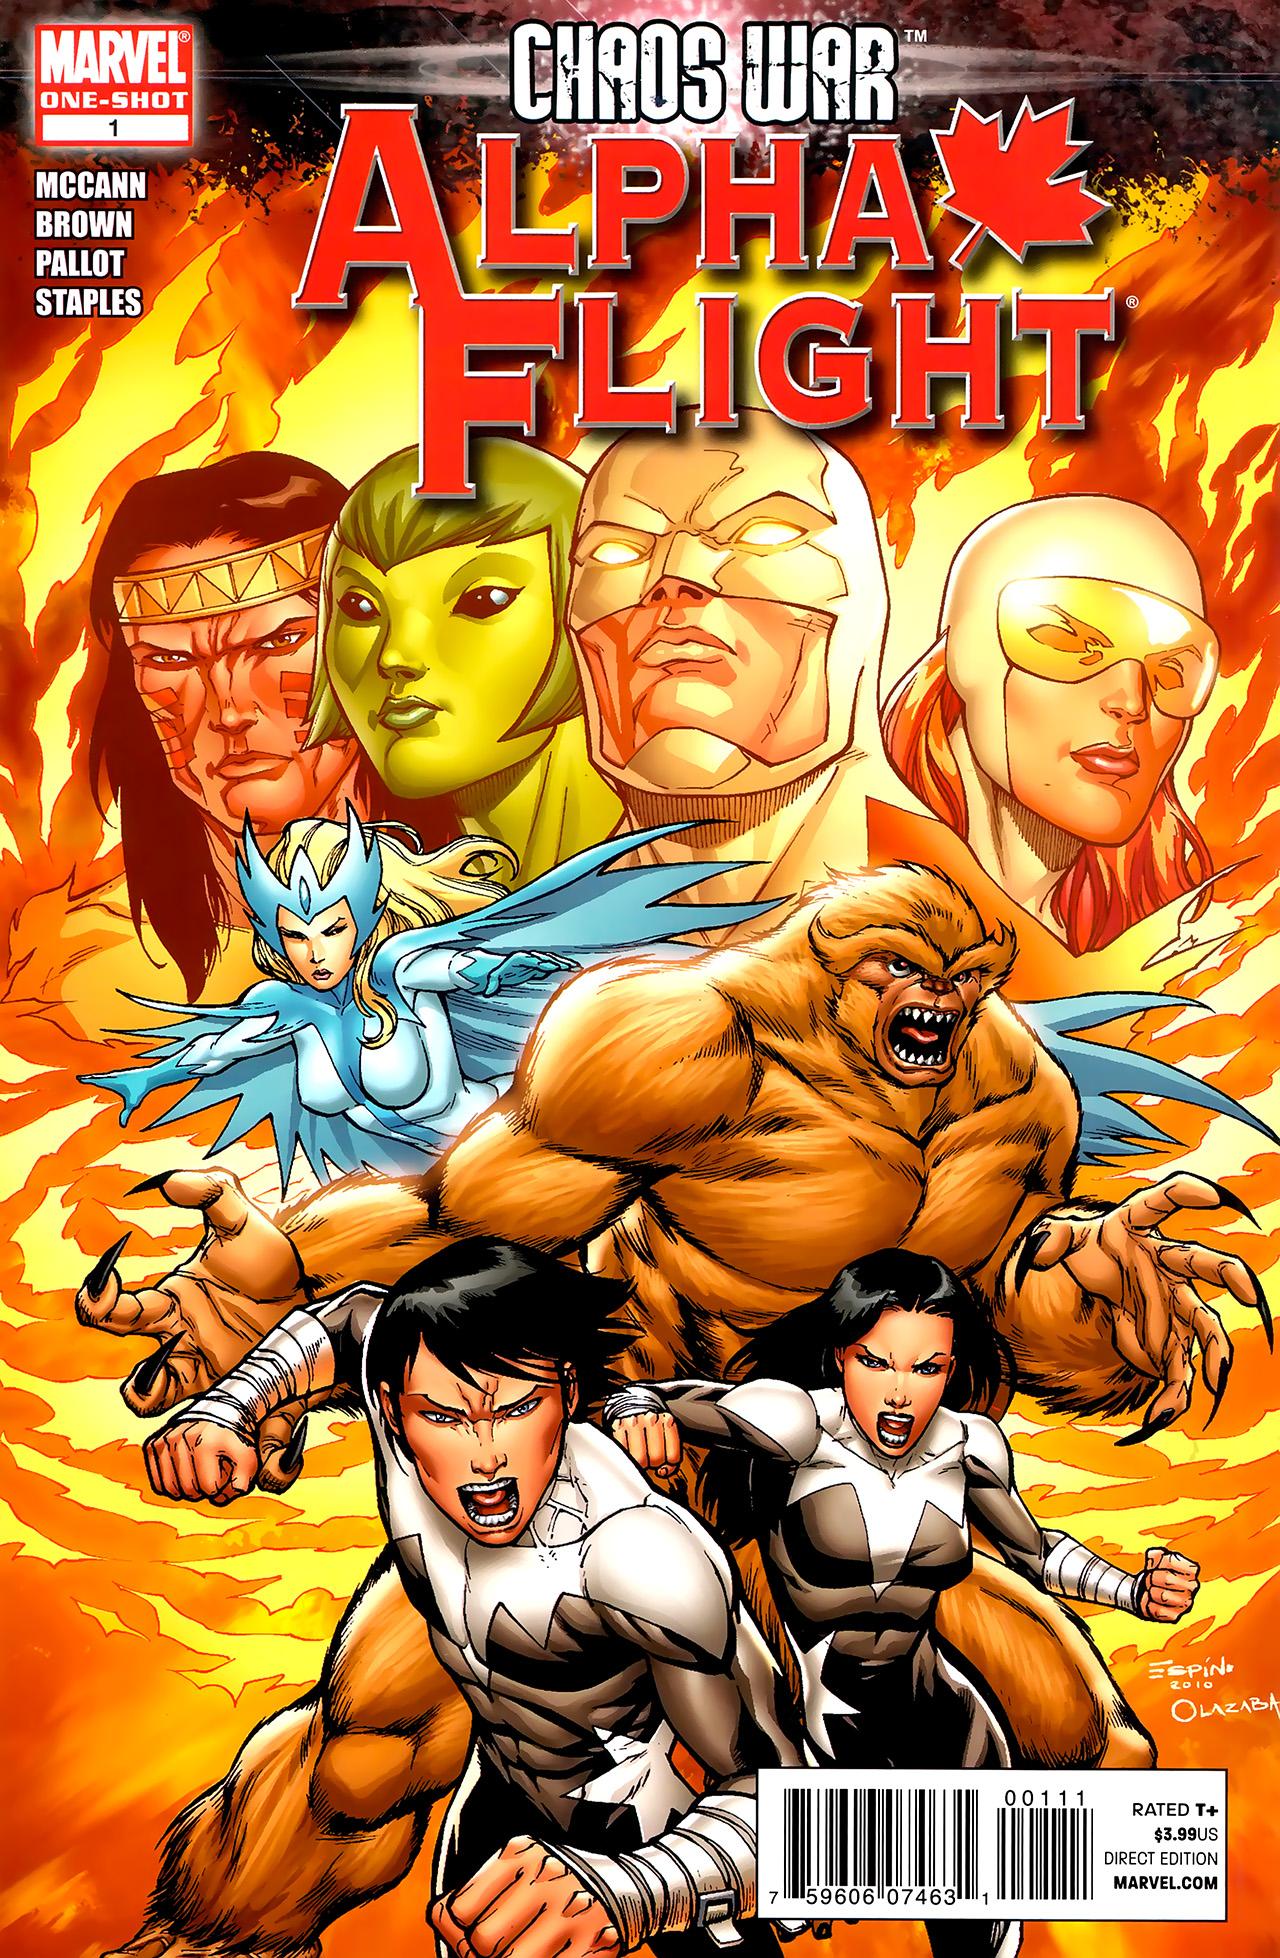 Read online Chaos War: Alpha Flight comic -  Issue # Full - 1